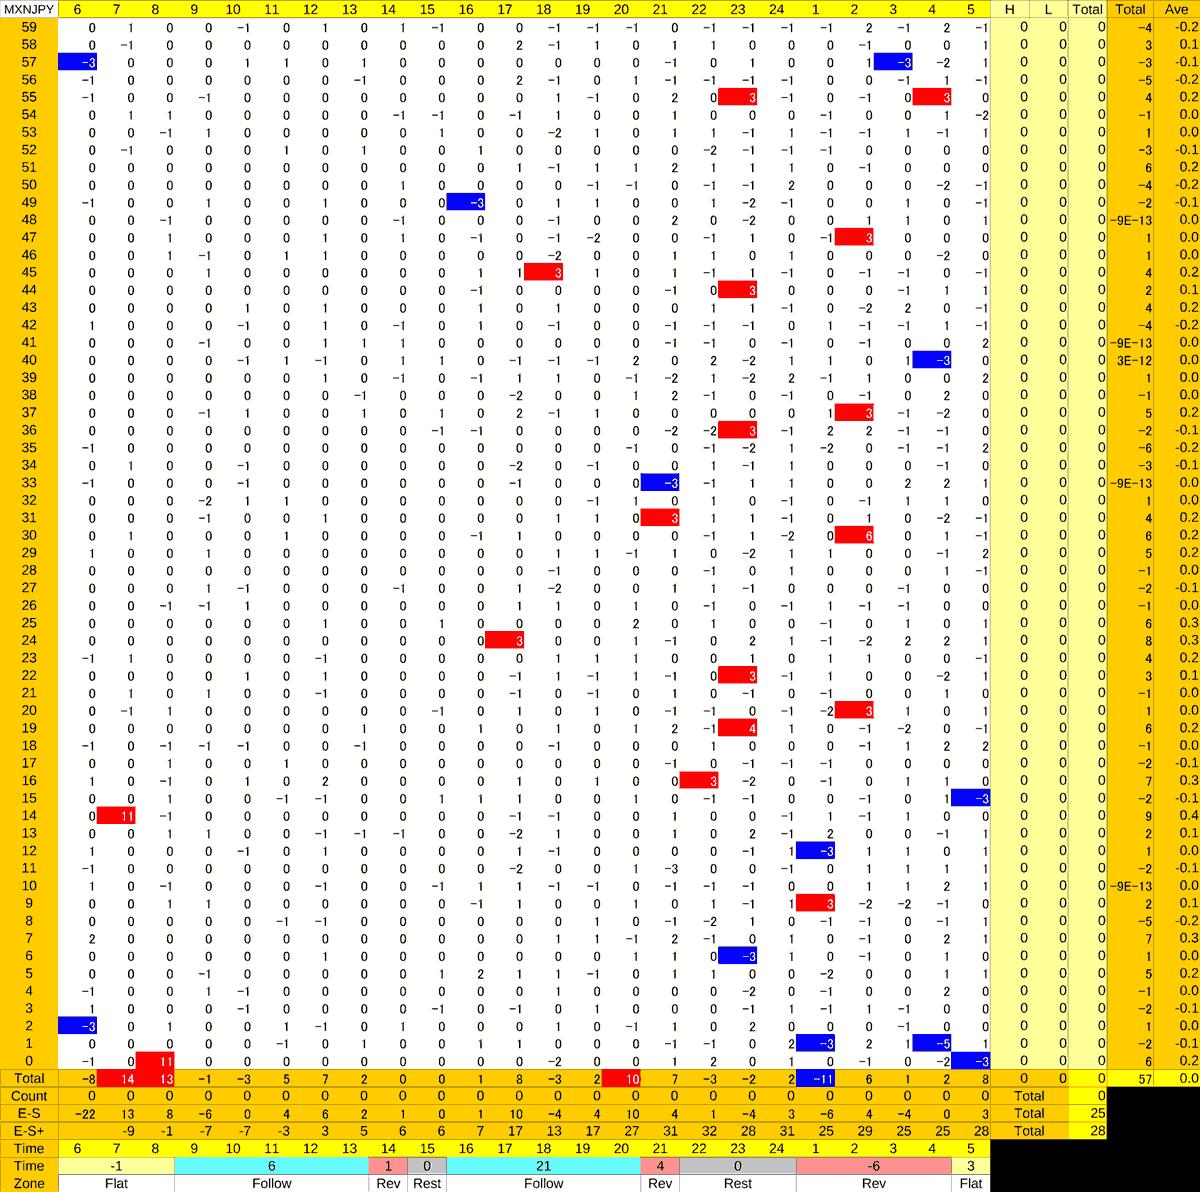 20210211_HS(3)MXNJPY